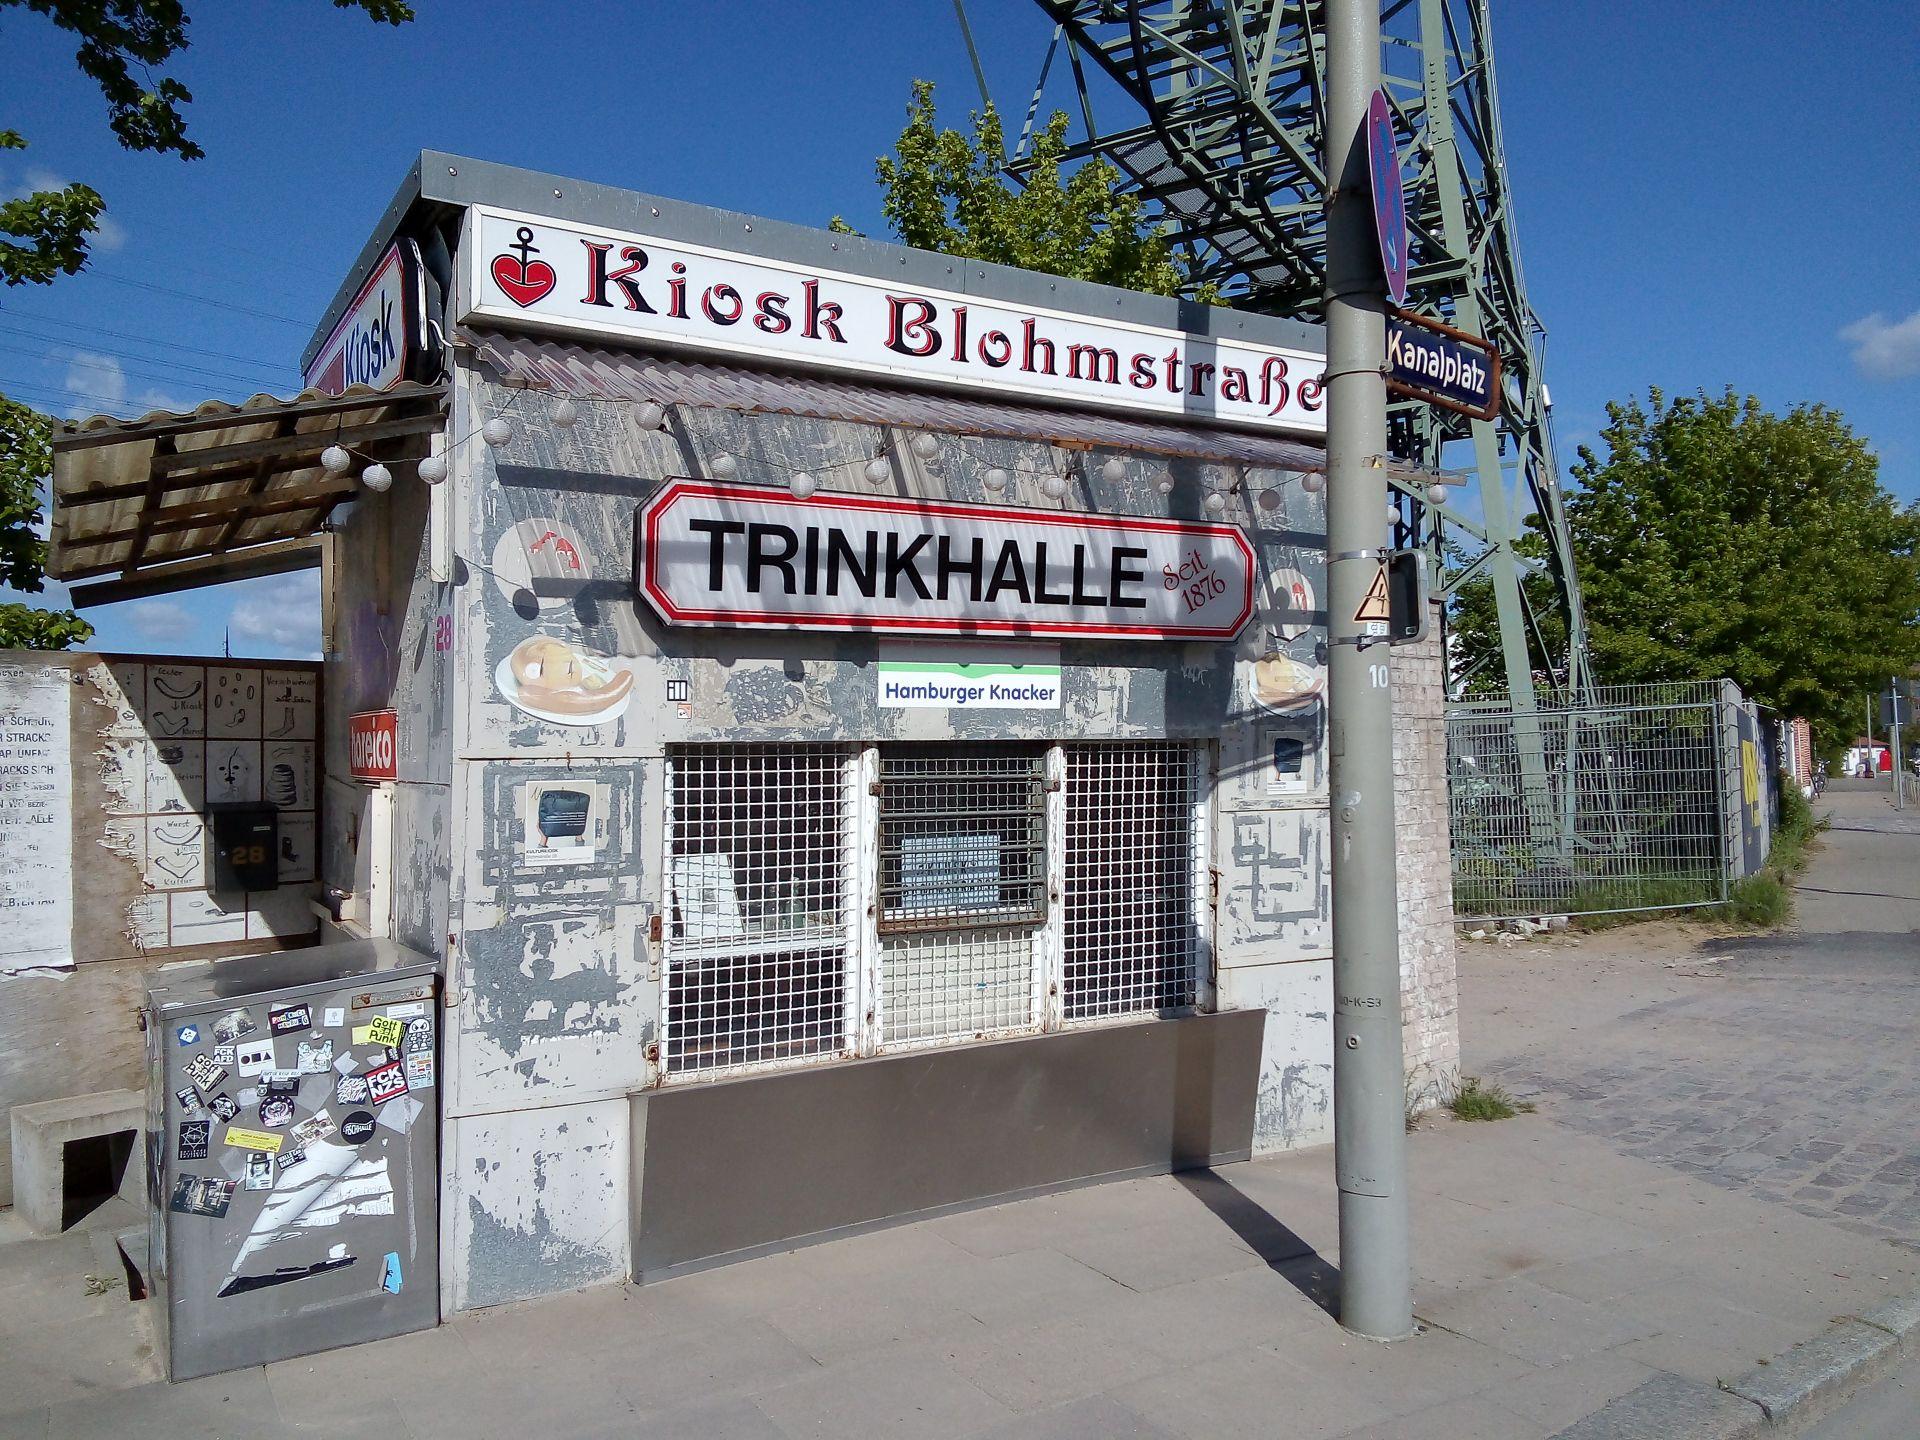 Denkmalplakette 2019 fuer den Kulturkiosk Blohmstrasse Harburg